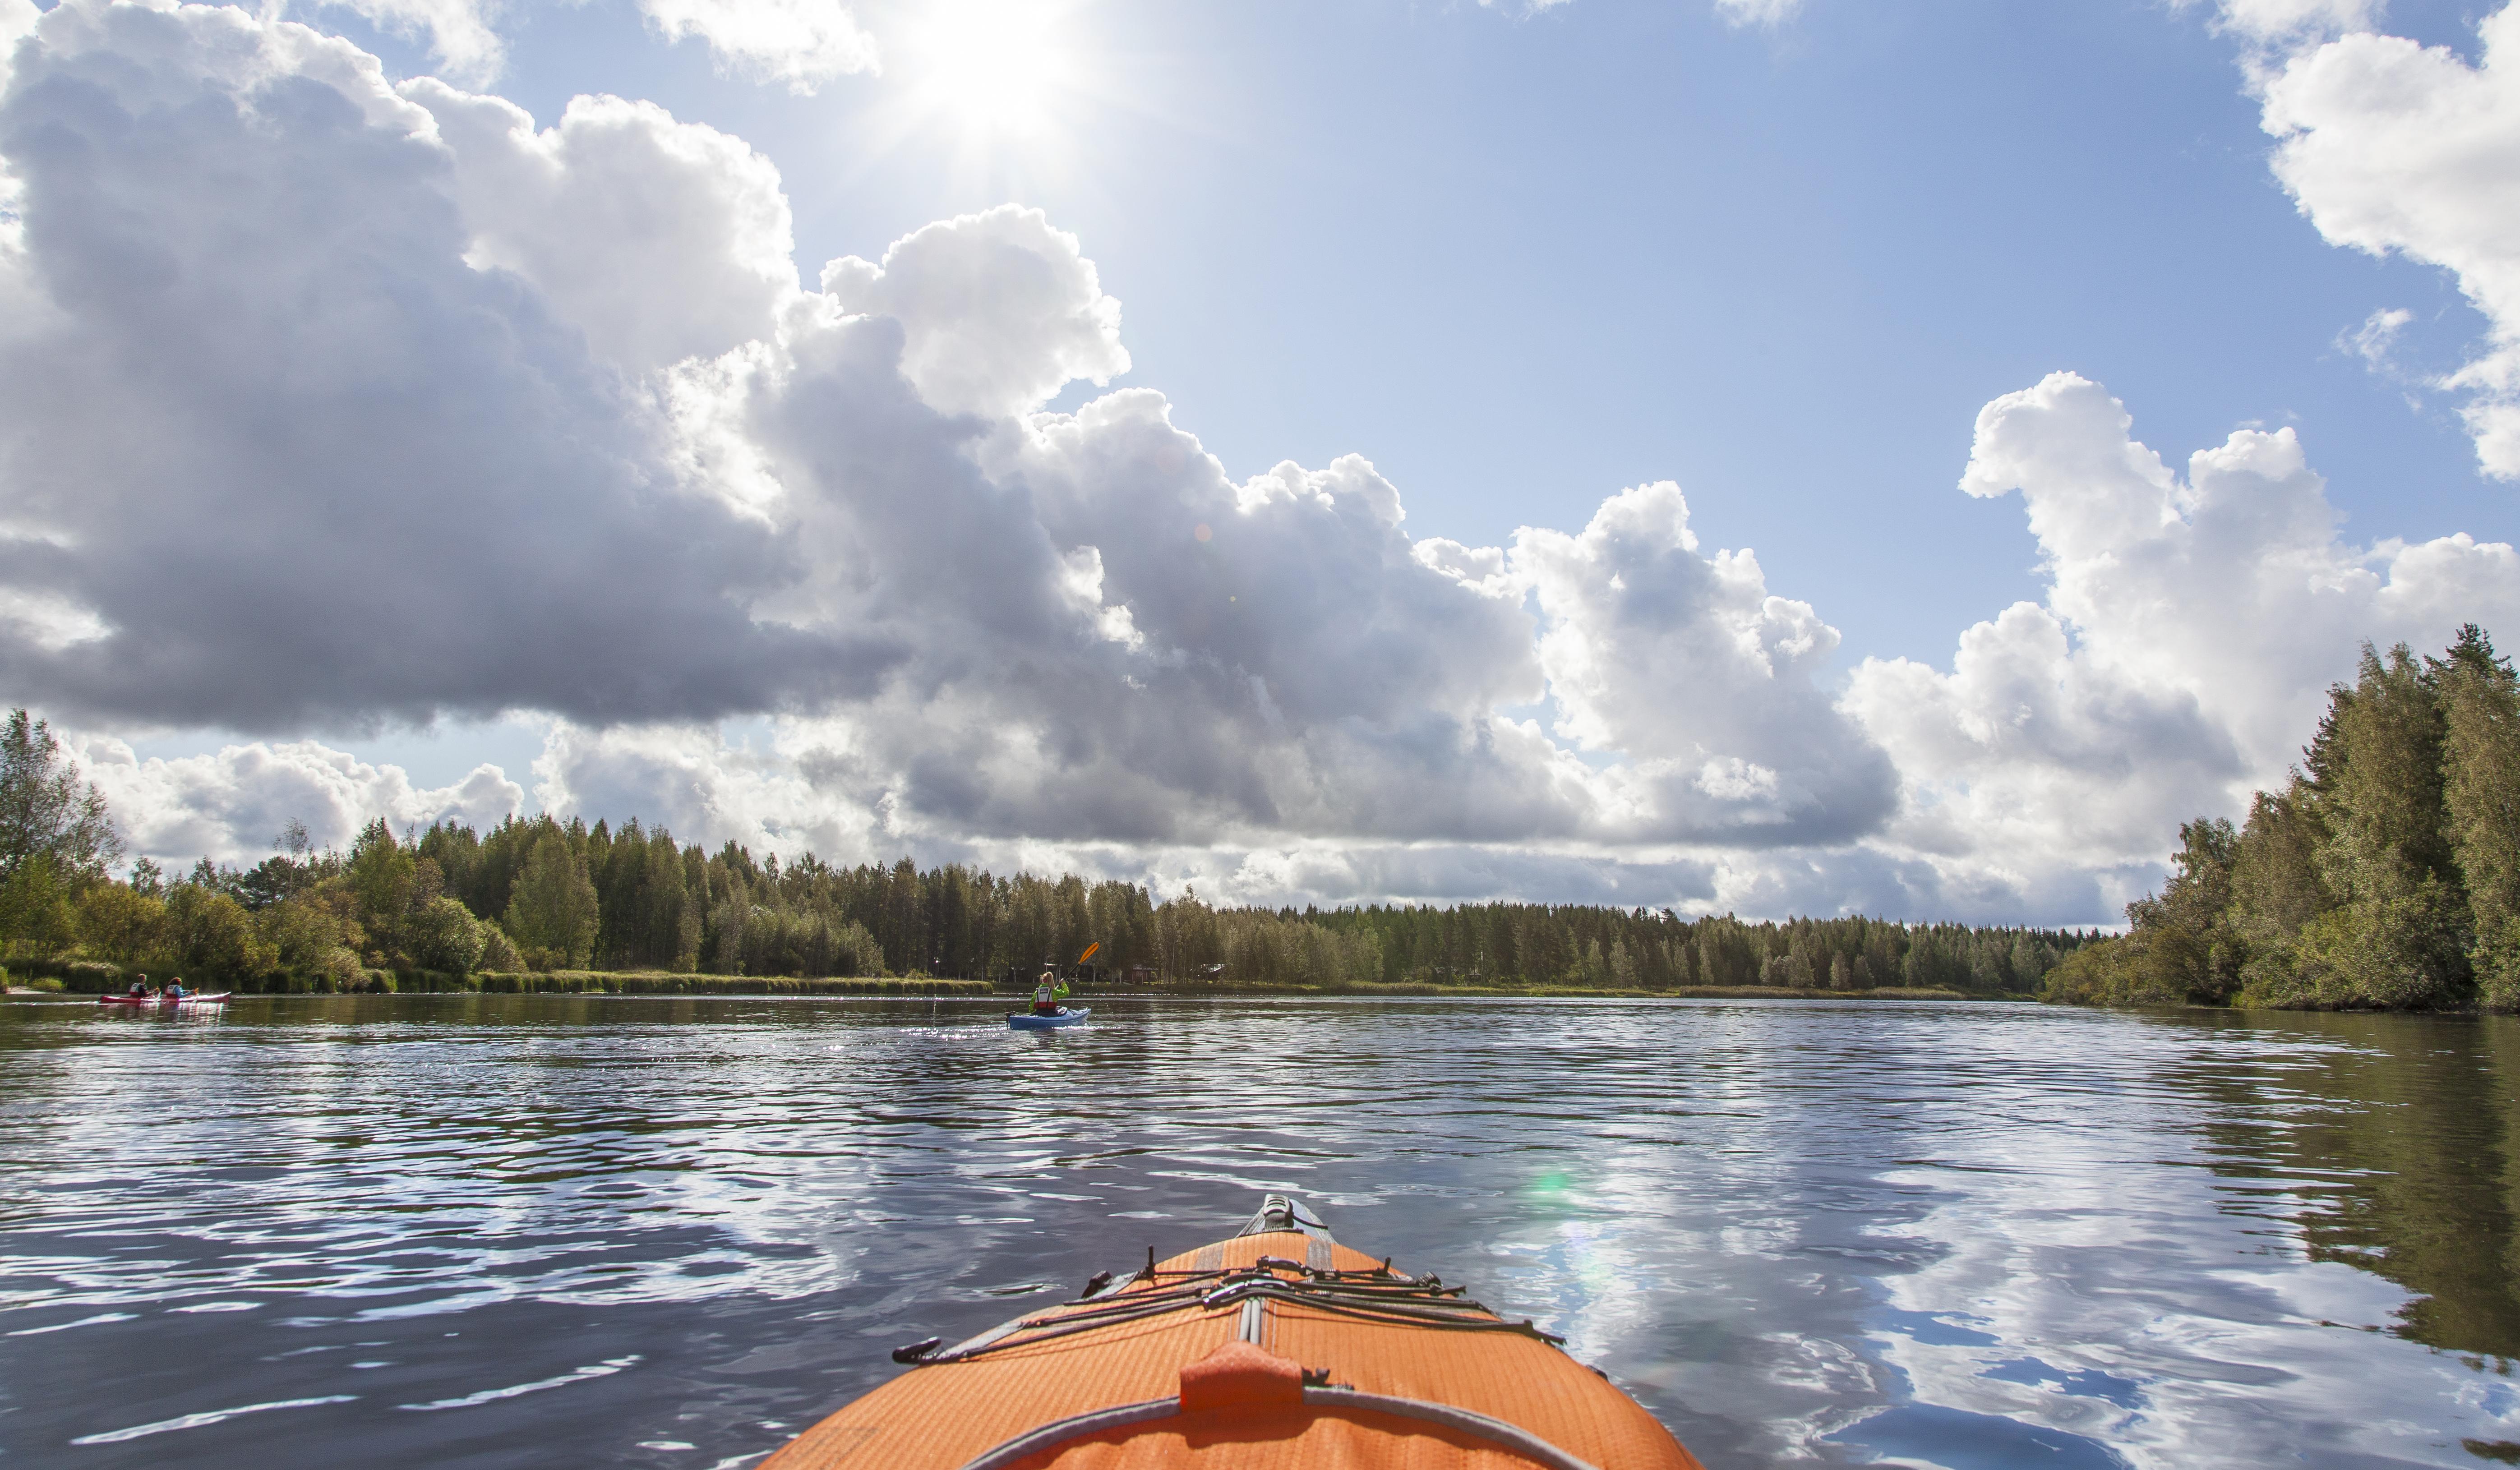 Kymijoki 1200 x 800